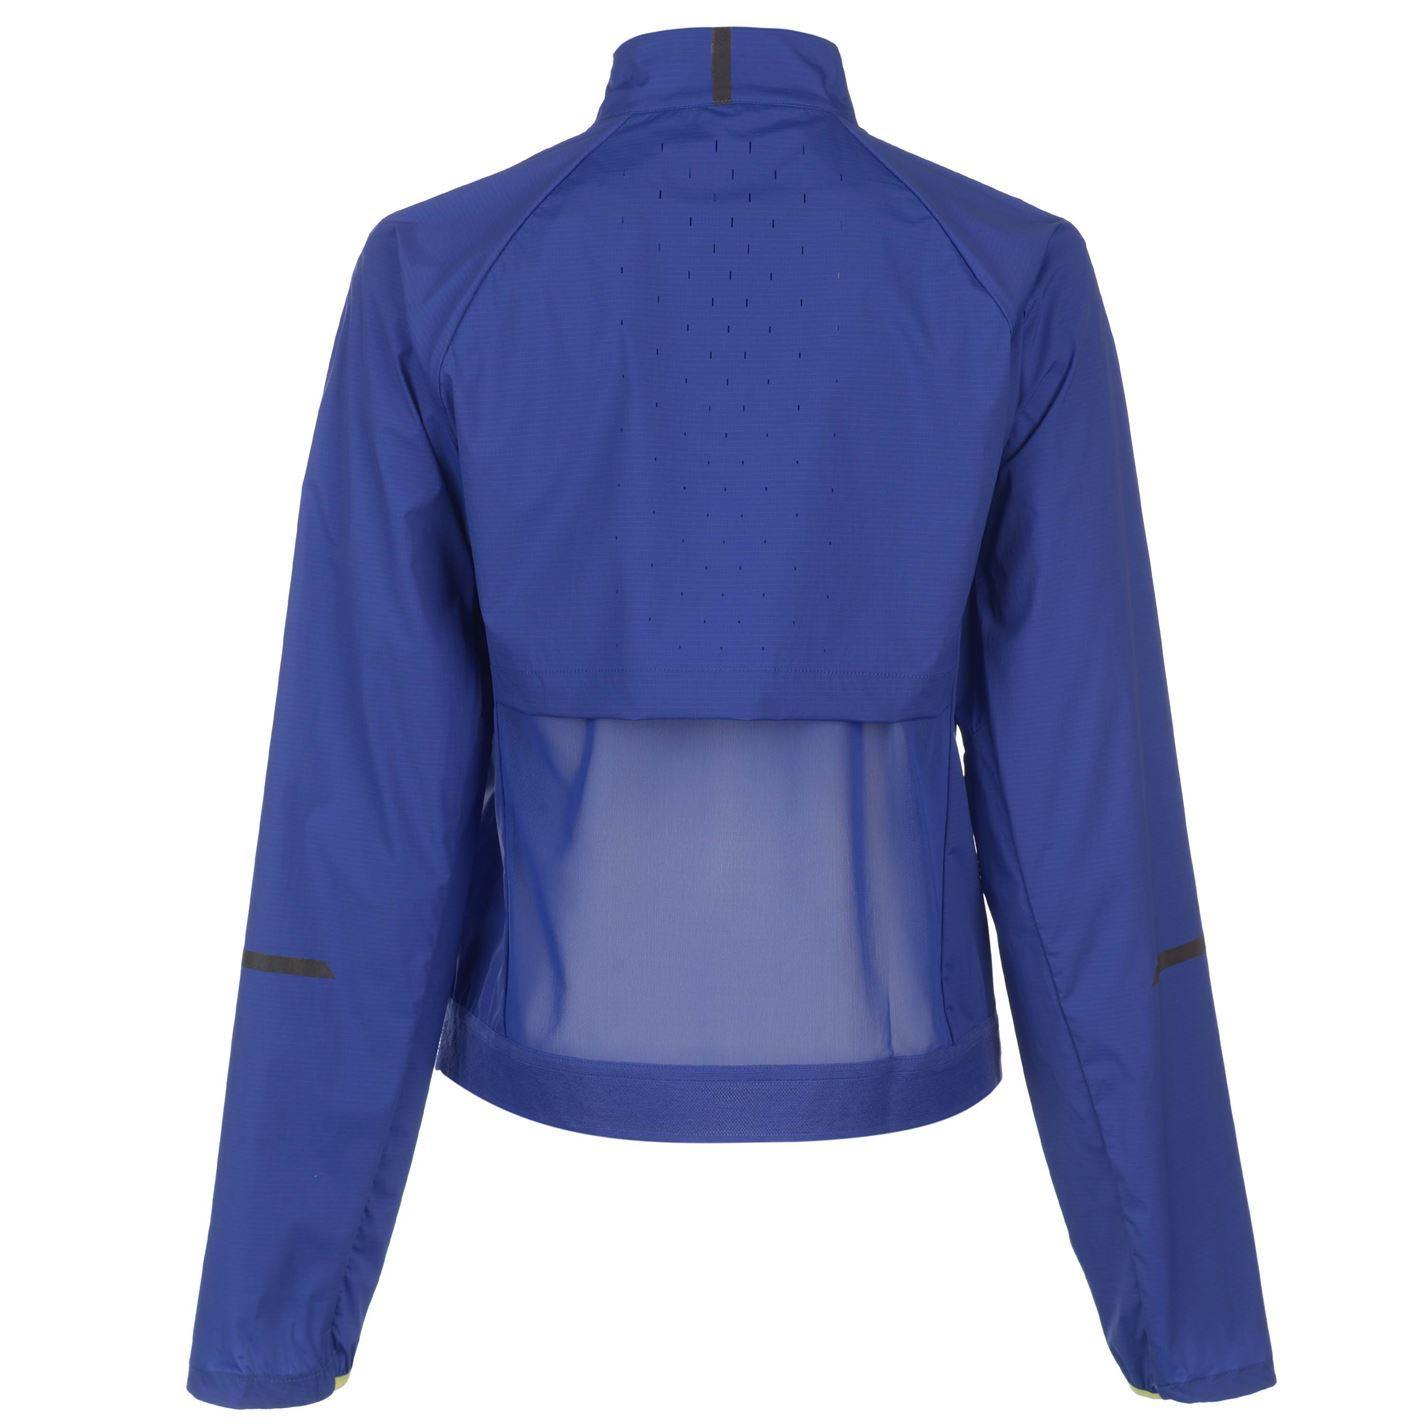 Details Balance Laufjacke New Damen Präzision Blau Oberteil Zu Fitness Jogging n8wOk0PX